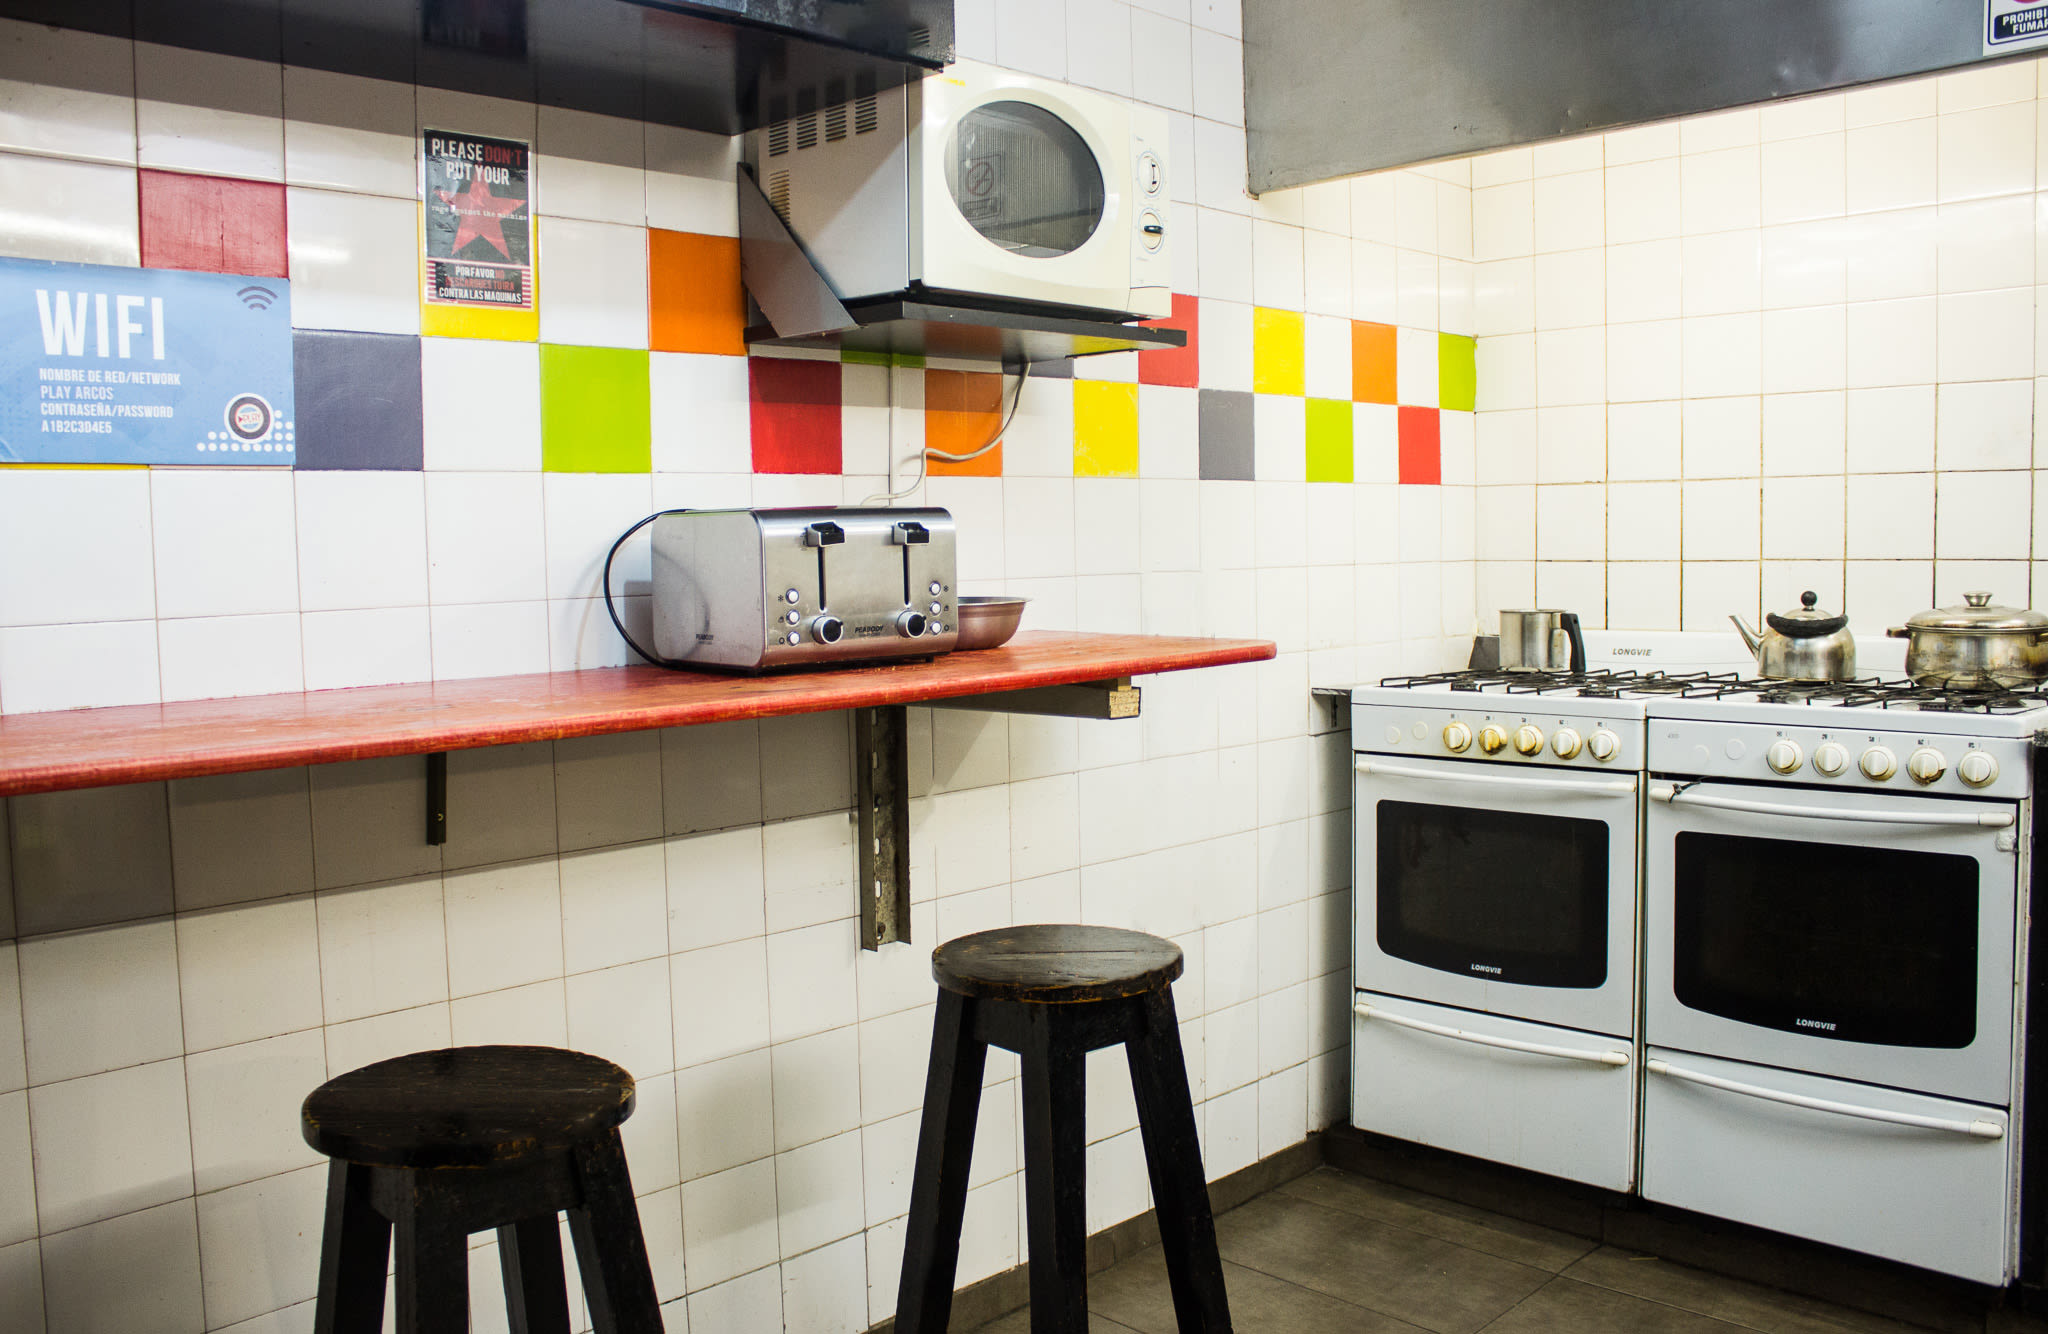 HOSTEL - Play Hostel Arcos